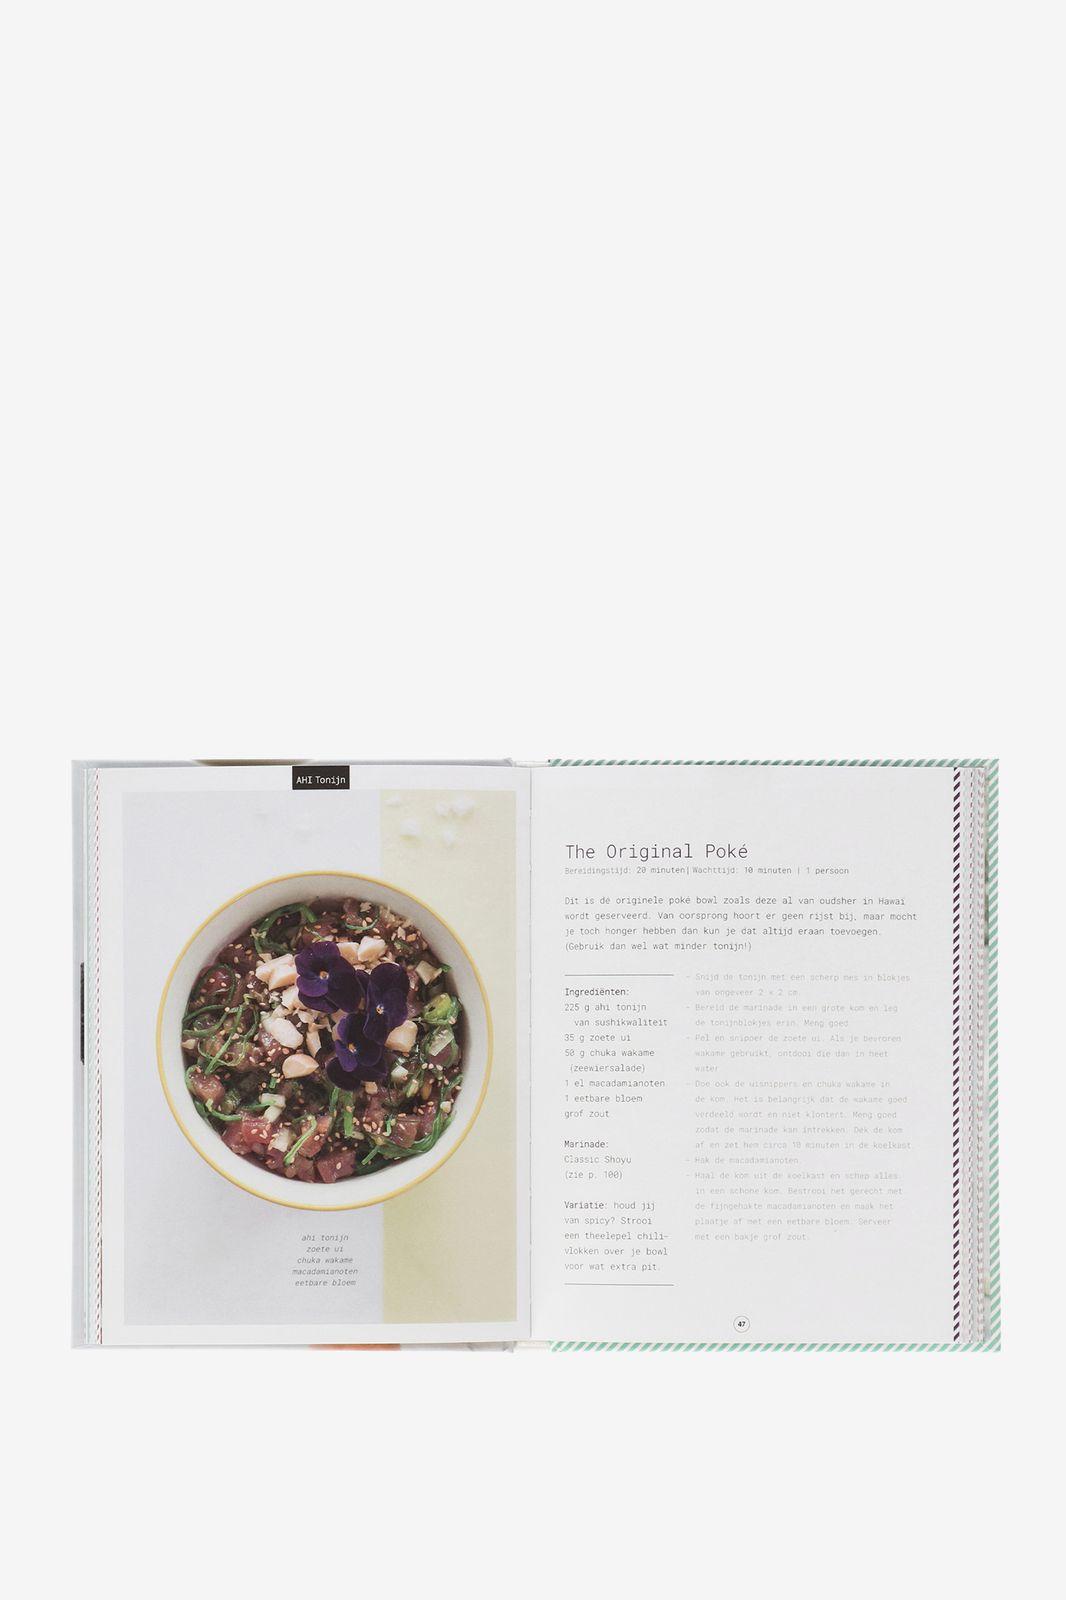 Het poké kookboek